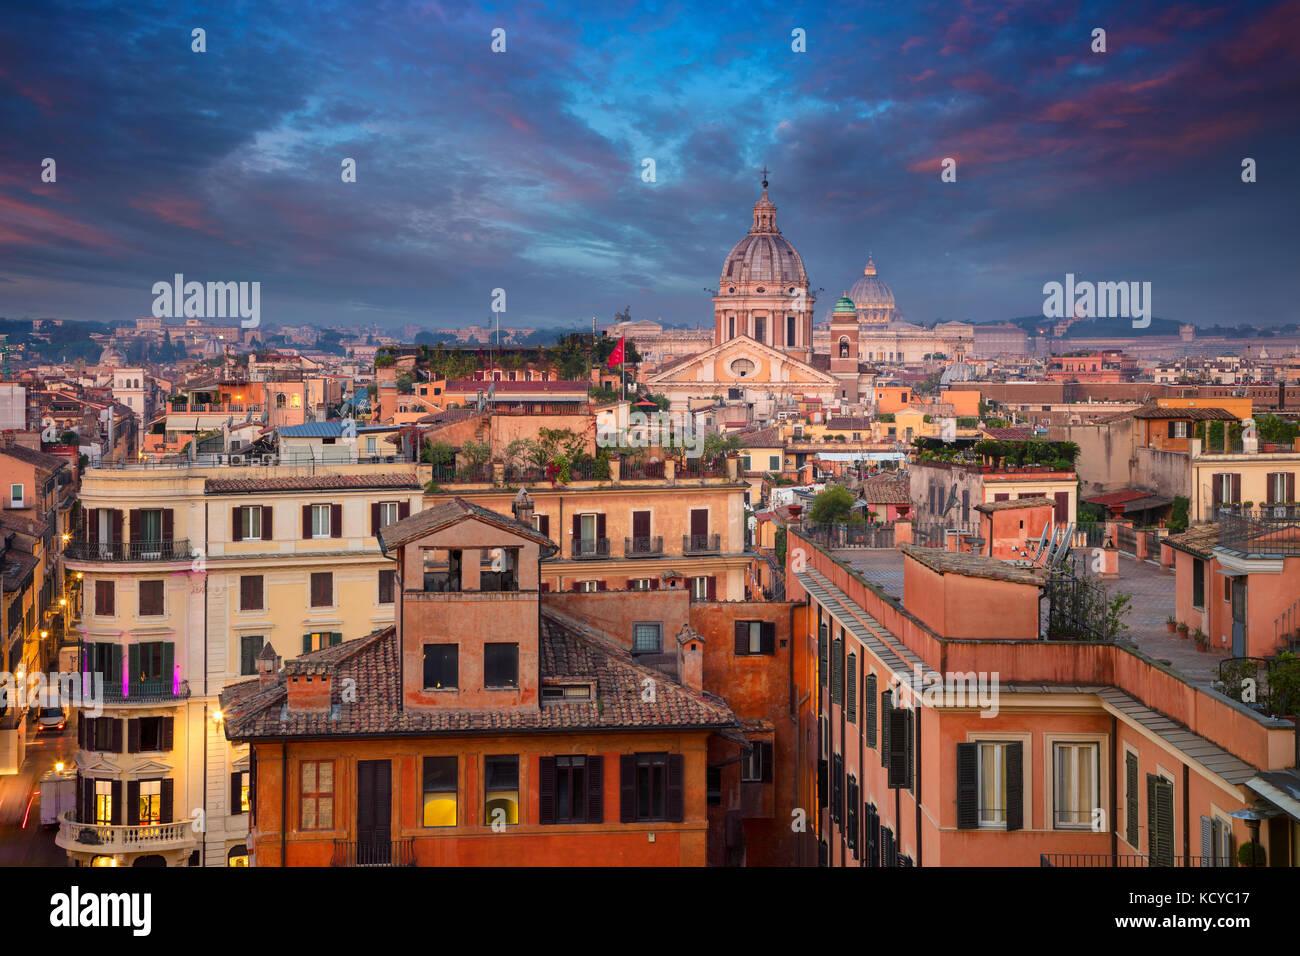 Rom. stadtbild Bild von Rom, Italien bei Sonnenaufgang. Stockbild